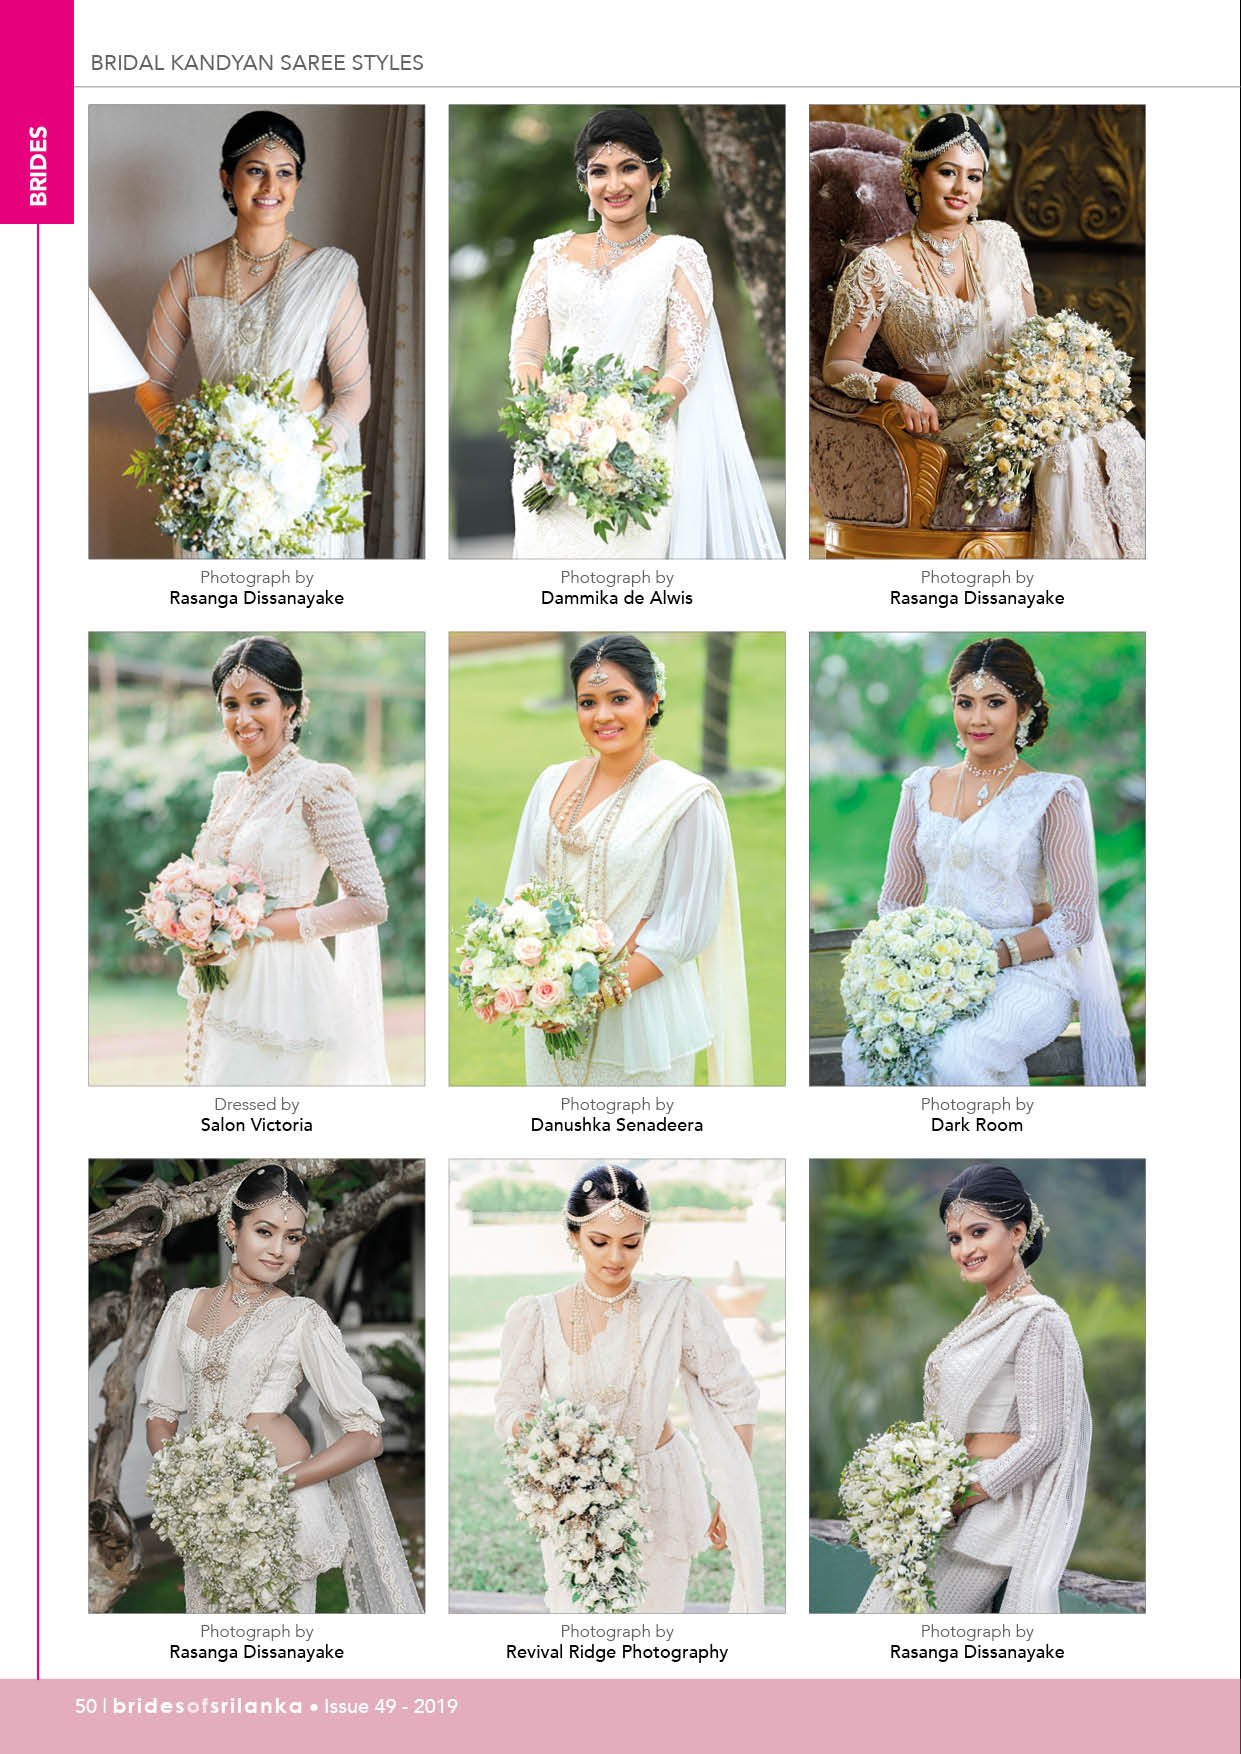 Brides Of Sri Lanka on Twitter